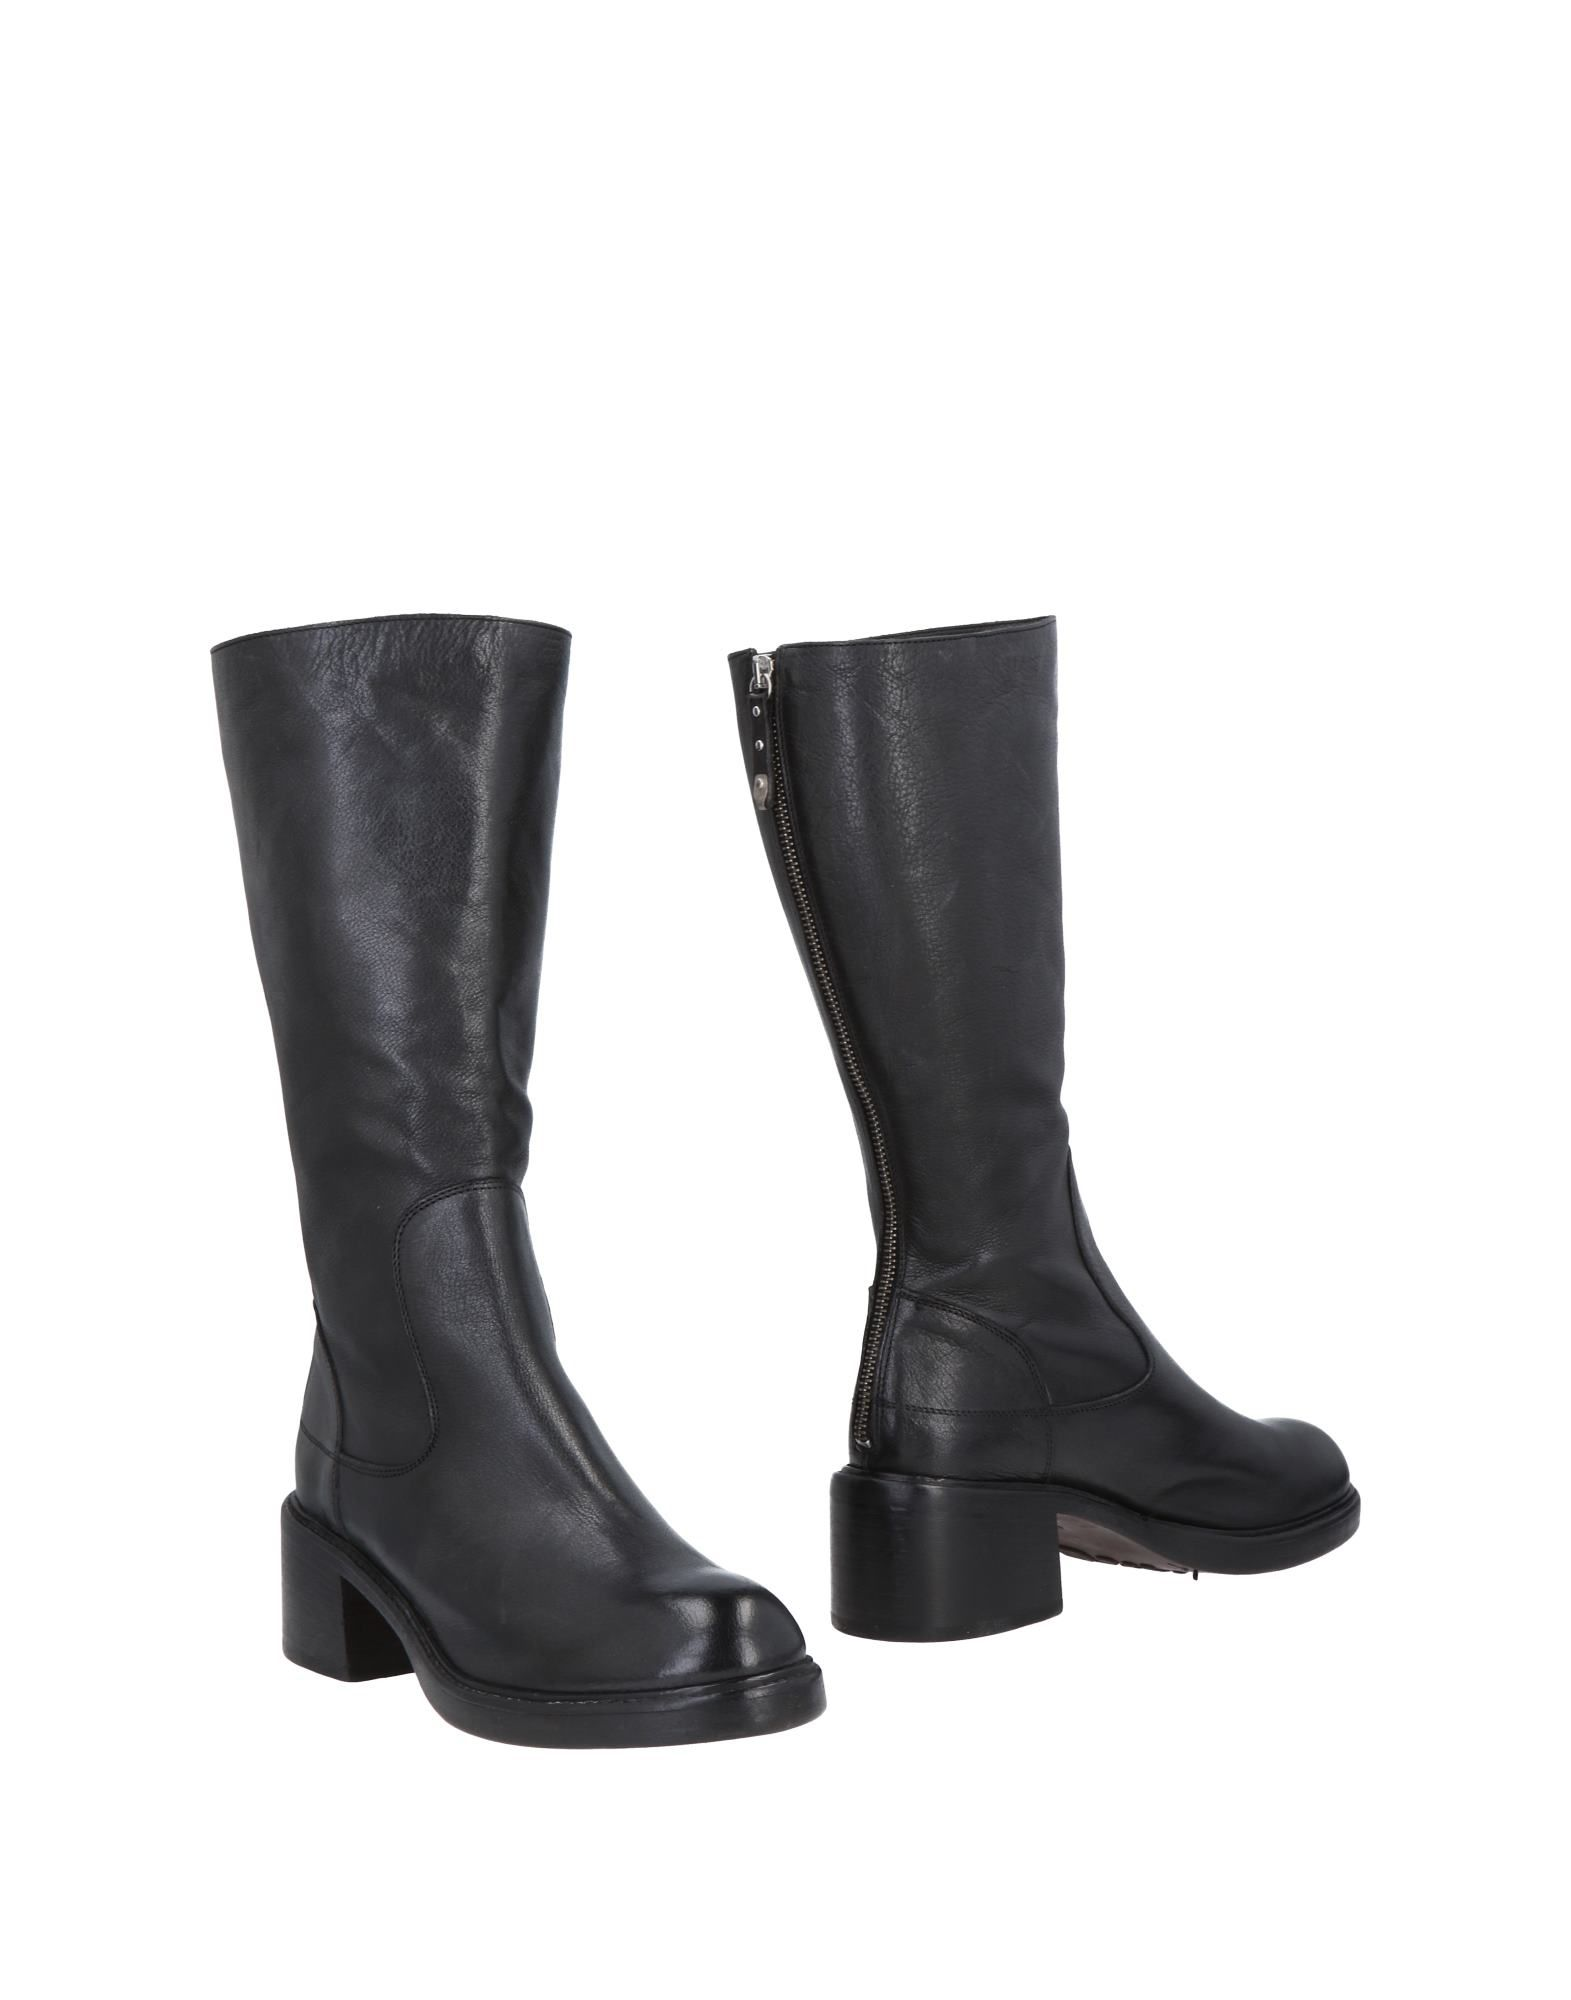 Rabatt Schuhe Stiefel Moma Stiefel Schuhe Damen  11501432JP 5c9299